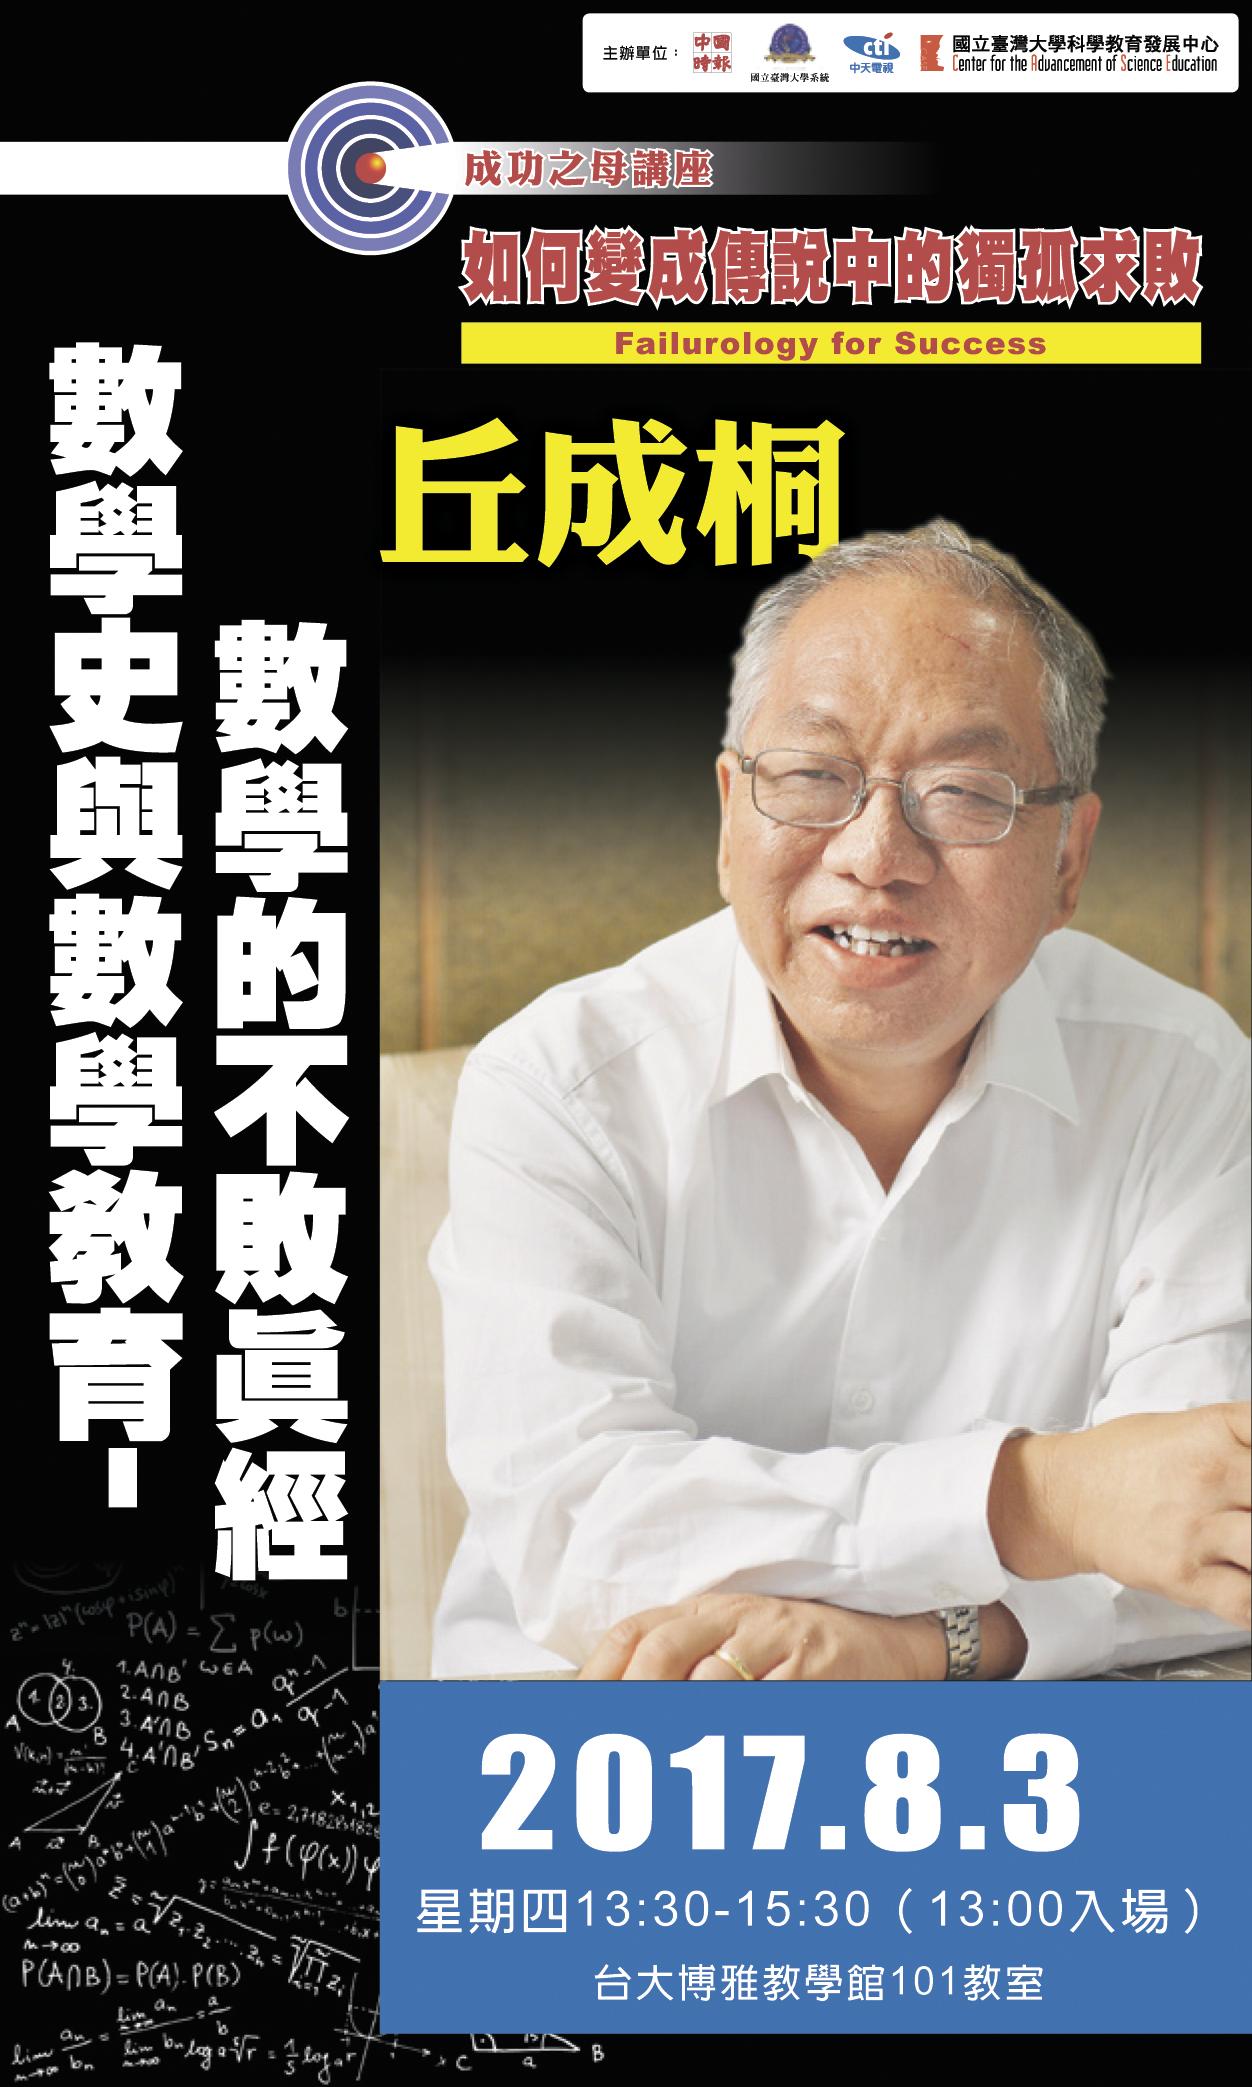 丘成桐 poster